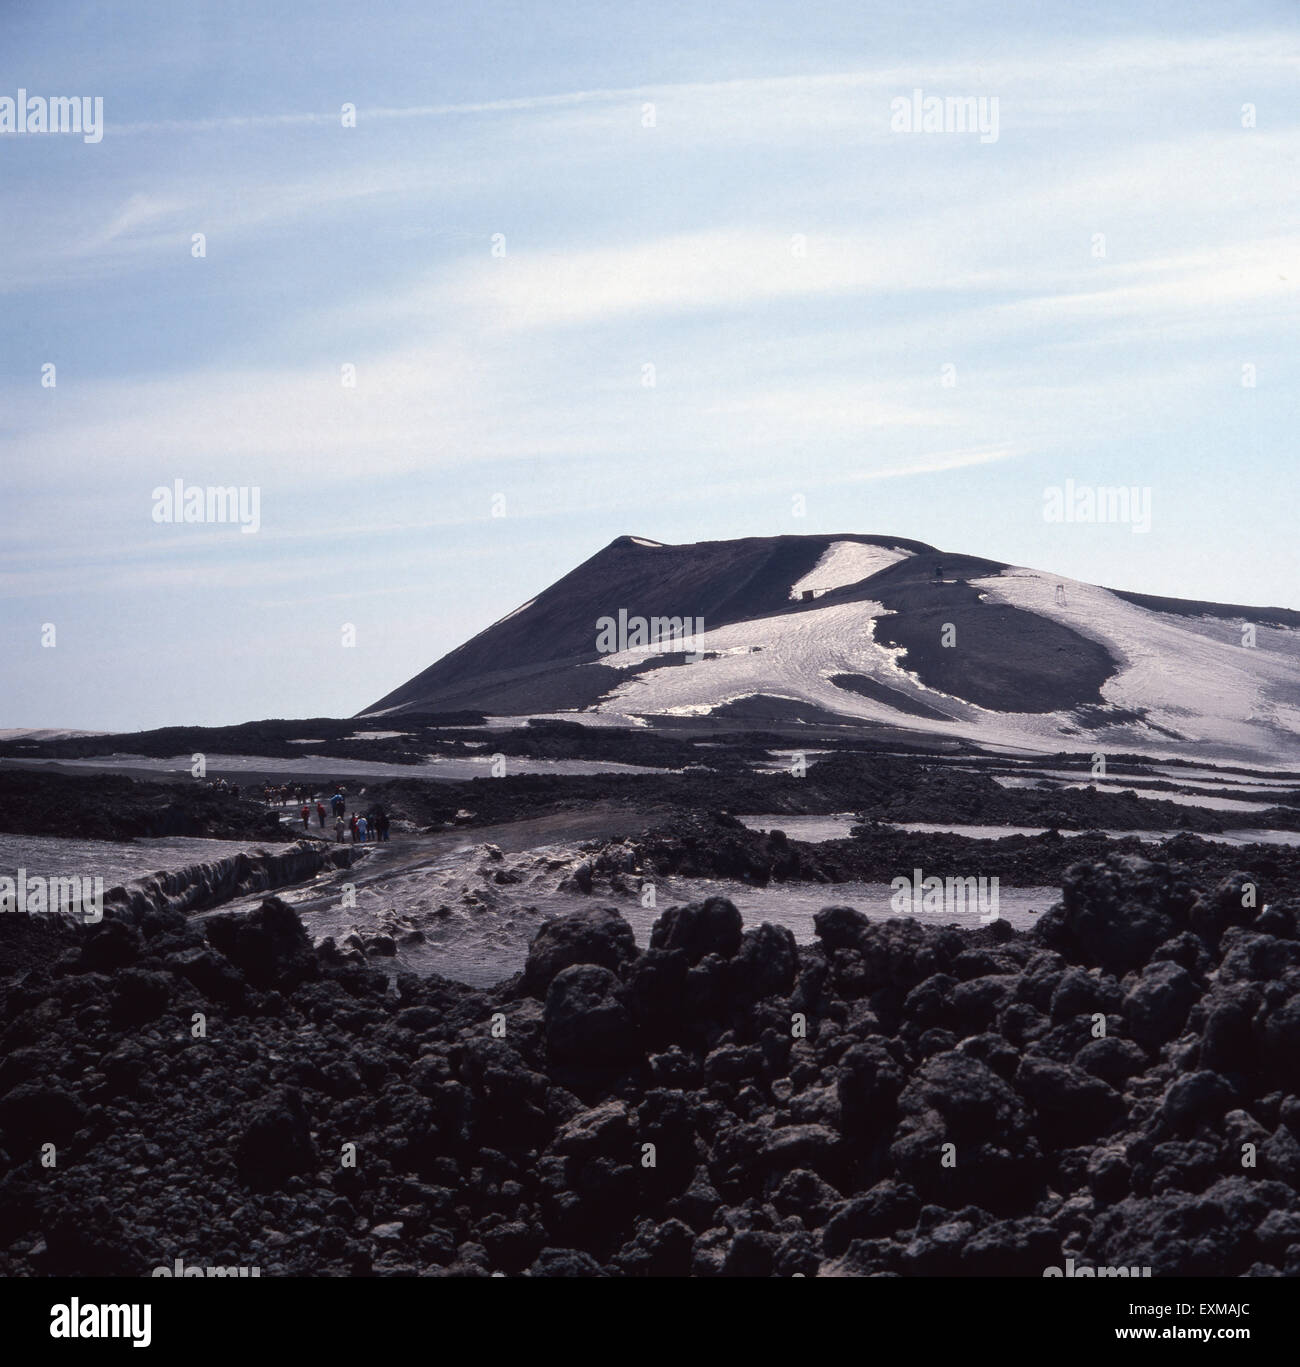 Der Vulkan Ätna in Sizilien, Italien 1970er Jahre. Mount Etna in Sicily, Italy 1970s. - Stock Image